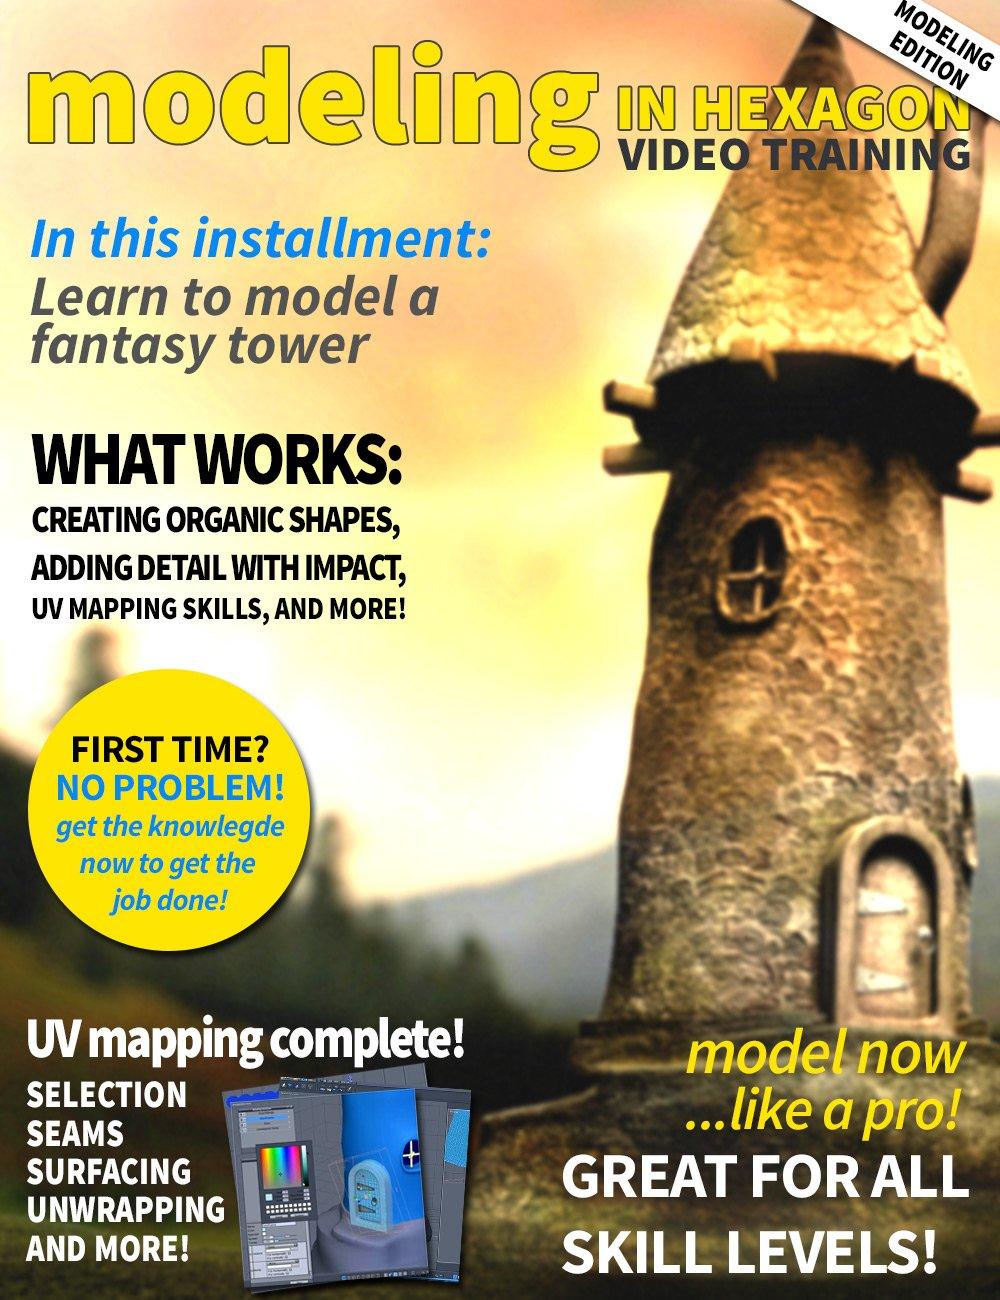 Modeling in Hexagon - Fantasy Tower by: Fugazi1968ironman13, 3D Models by Daz 3D